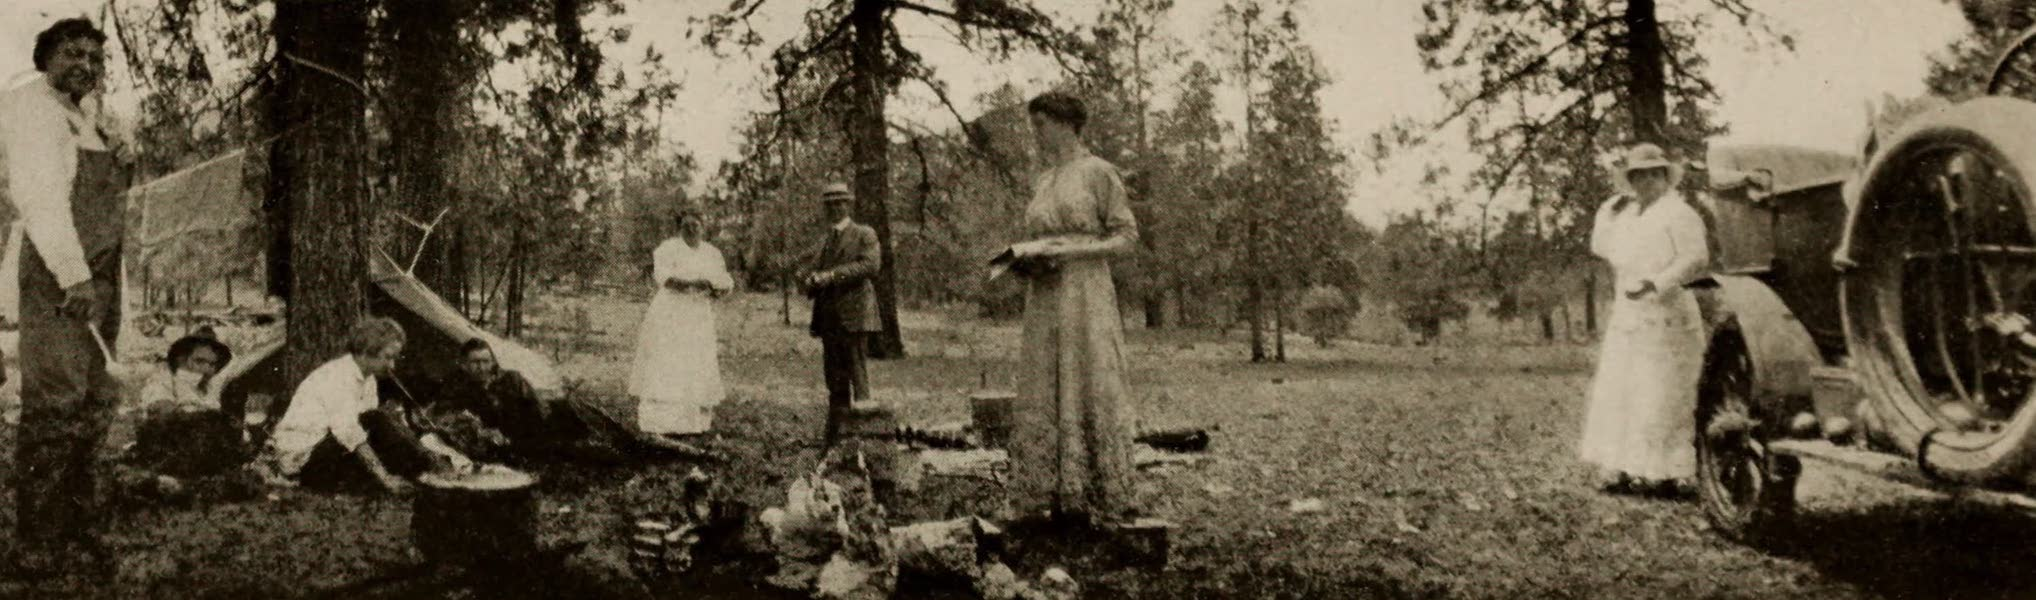 Arizona, The Wonderland - Camping Under the Pines at Coleman Lake, near Williams, Arizona (1917)